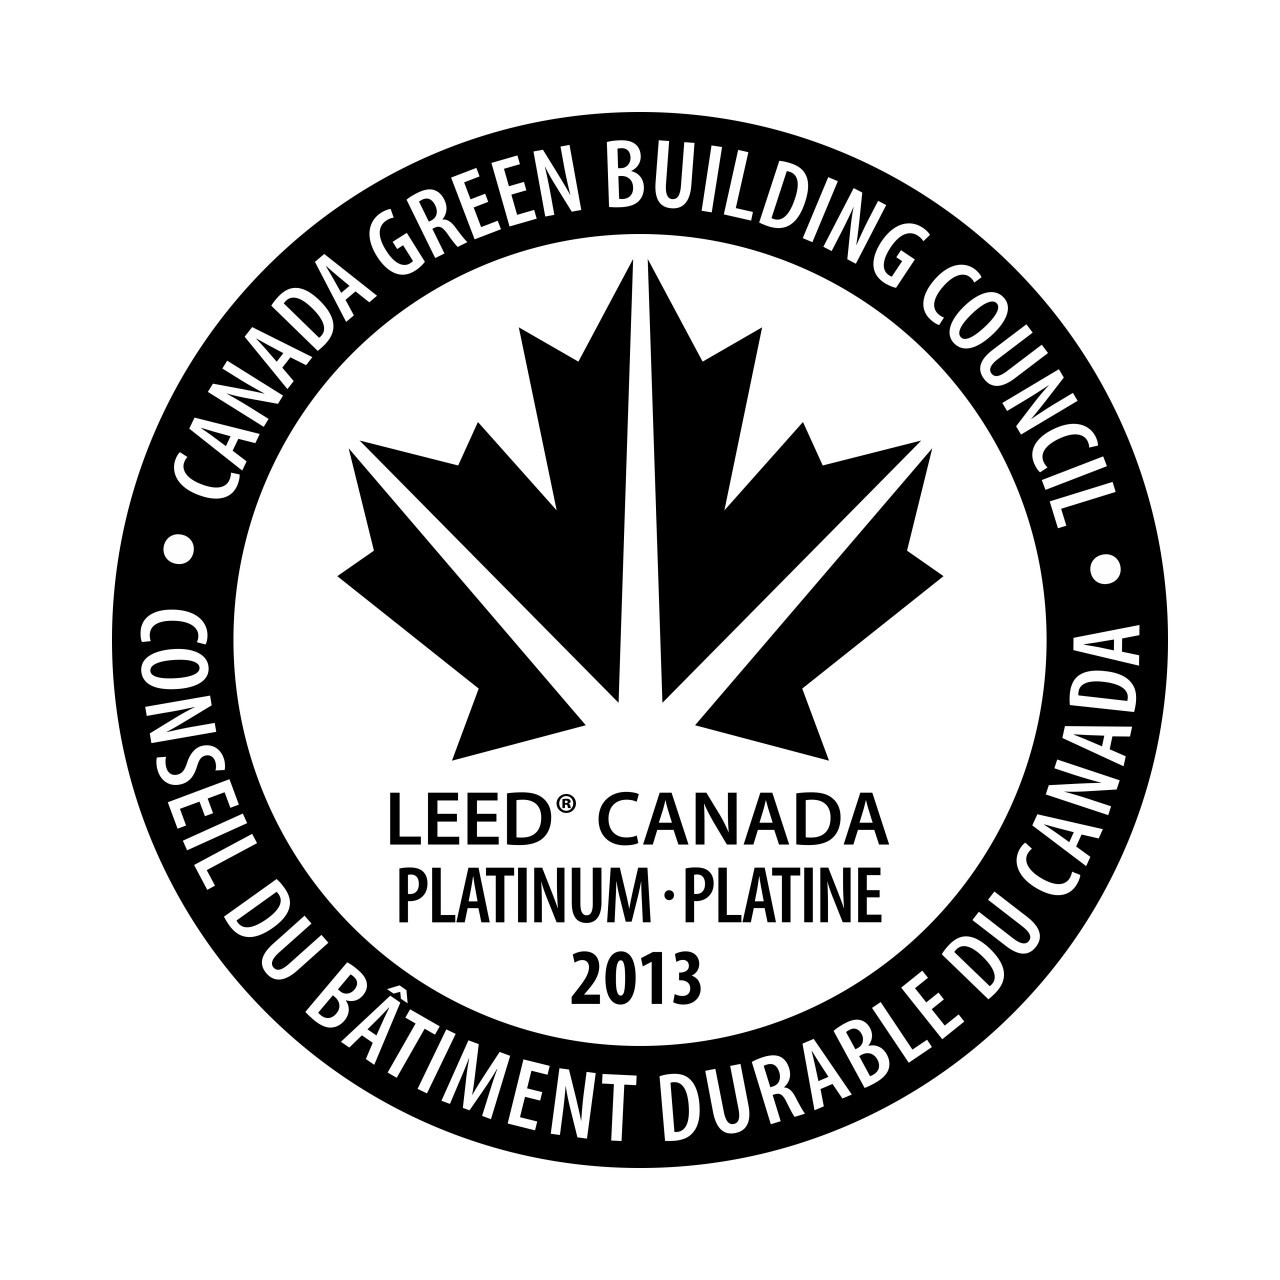 Black Cut Vinyl Decal 16 Set Of 2 Green Building Awards